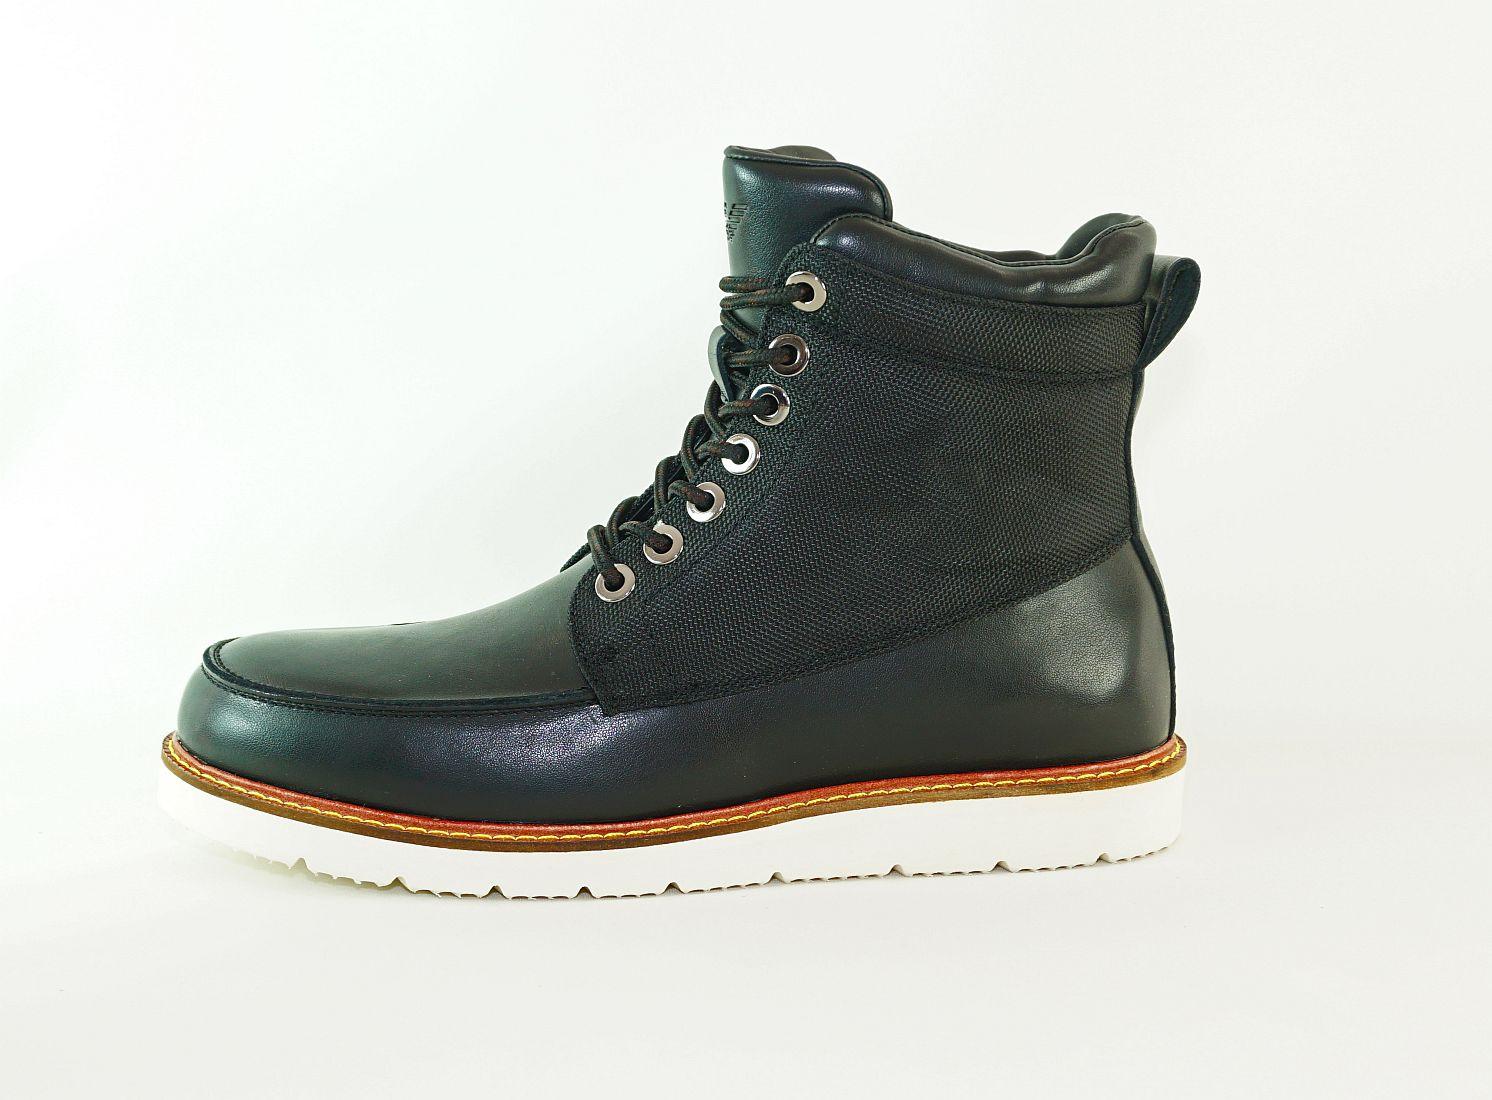 Armani Jeans Schuhe Stiefel Boot 935052 6A452 00020 Nero HW16-AJn